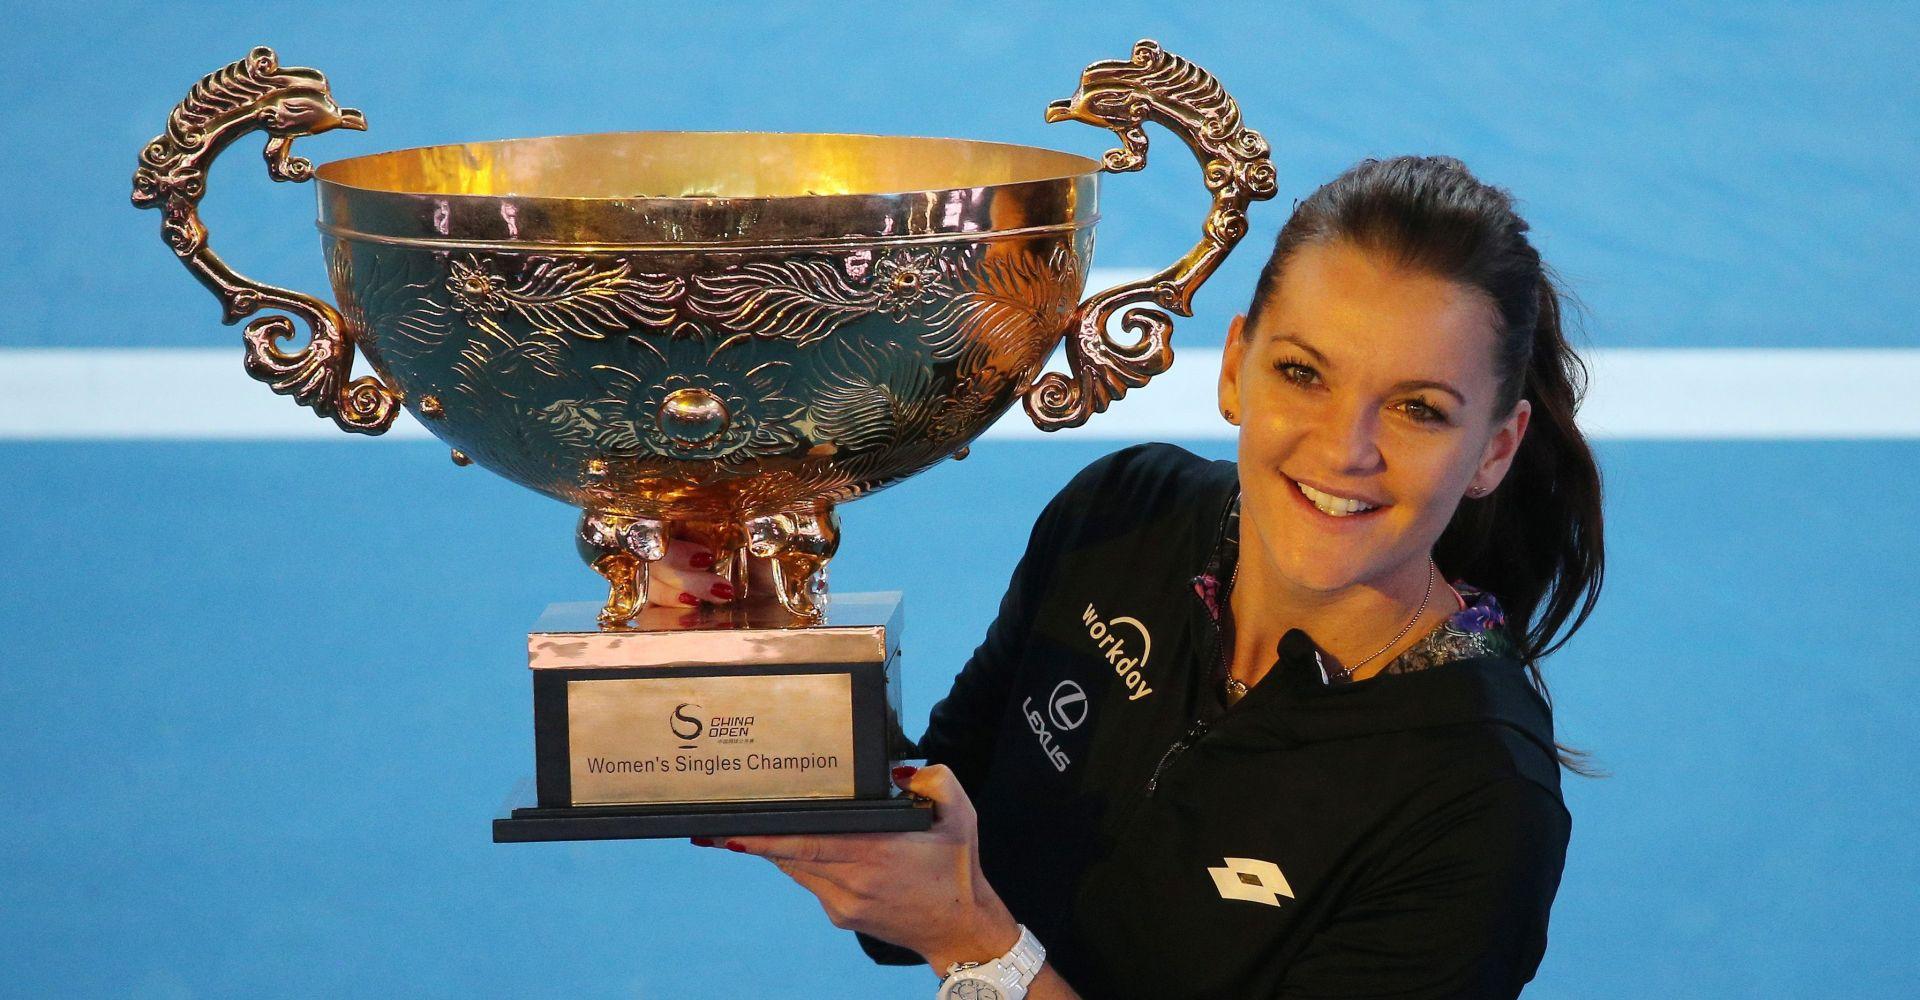 WTA PEKING Radwanska u finalu bolja od Konte